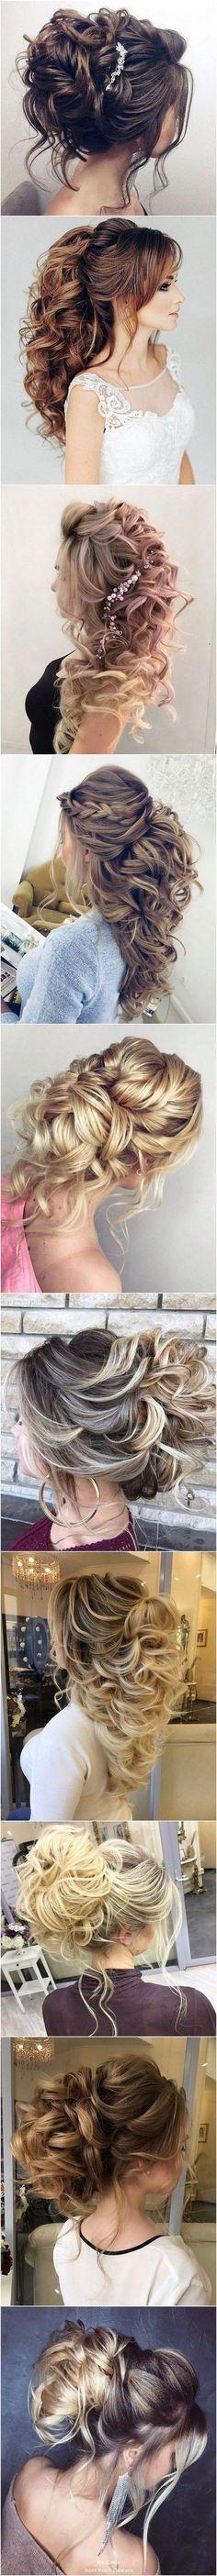 Coiffure De Mariage : Description Elstile Long Wedding Hairstyle Inspiration / www.deerpearlflow…